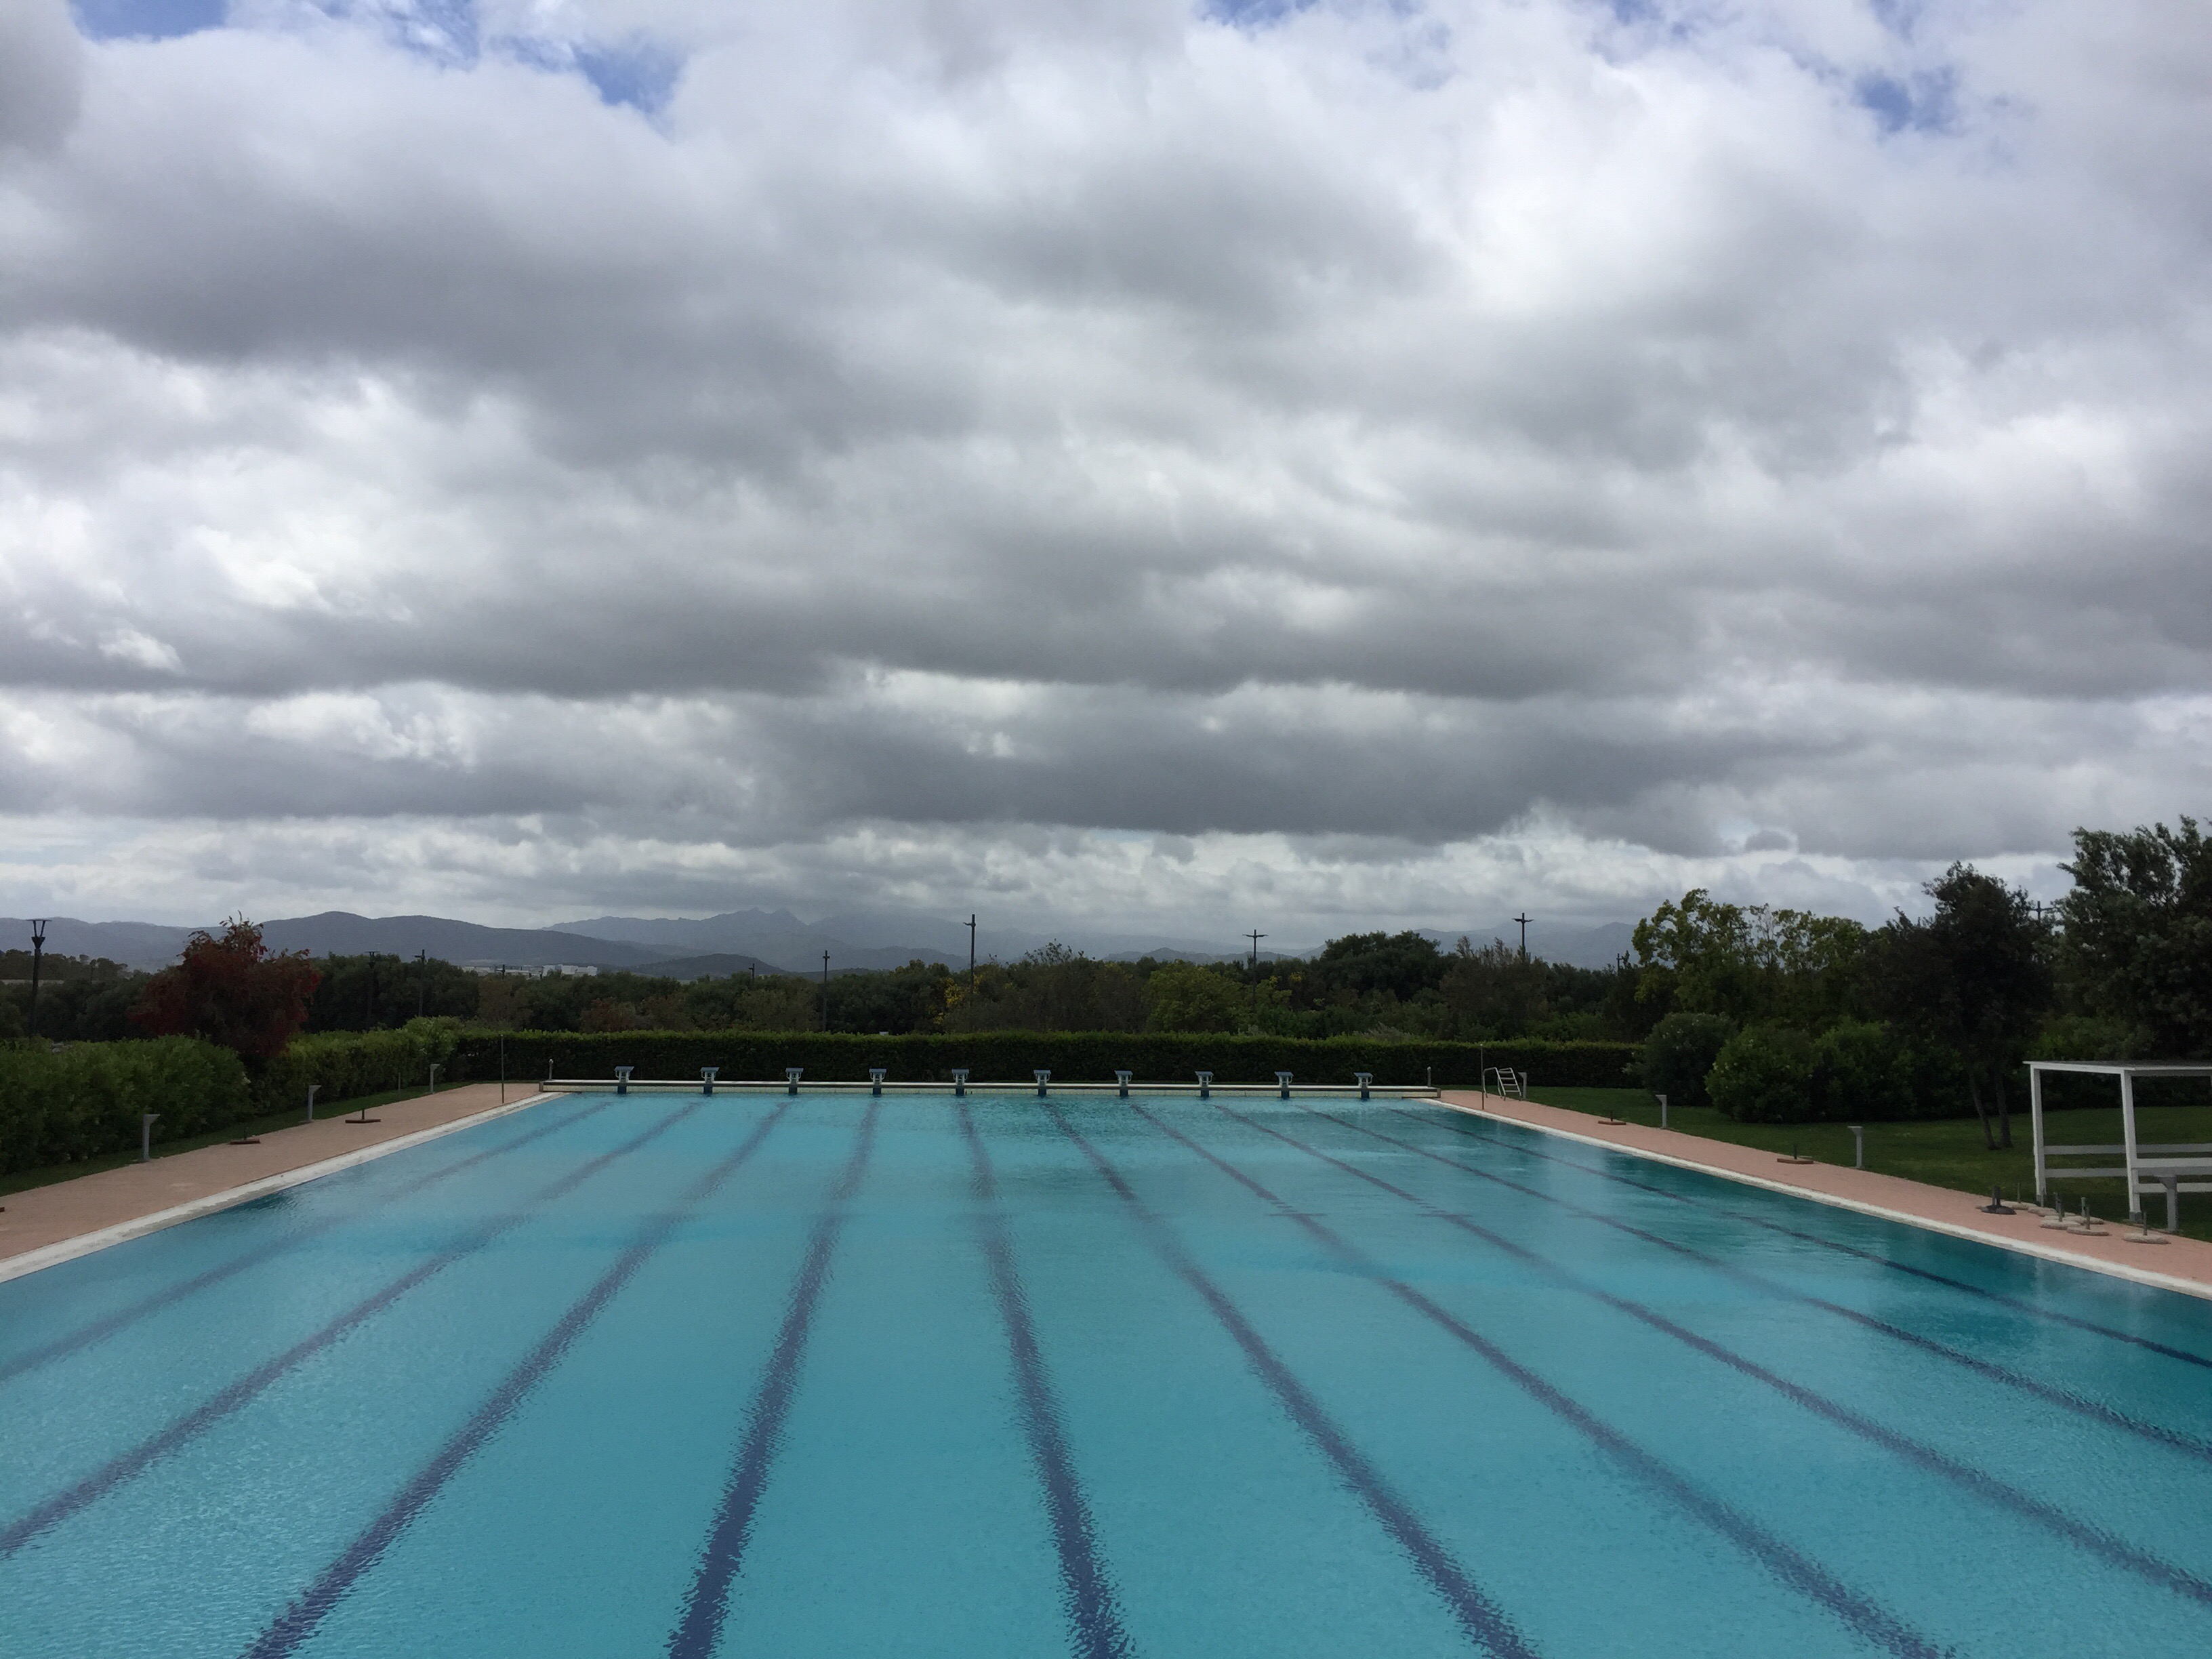 Olympic size swimming pool at Geo Village | Olbia, Sardinia | BrowsingItaly.com